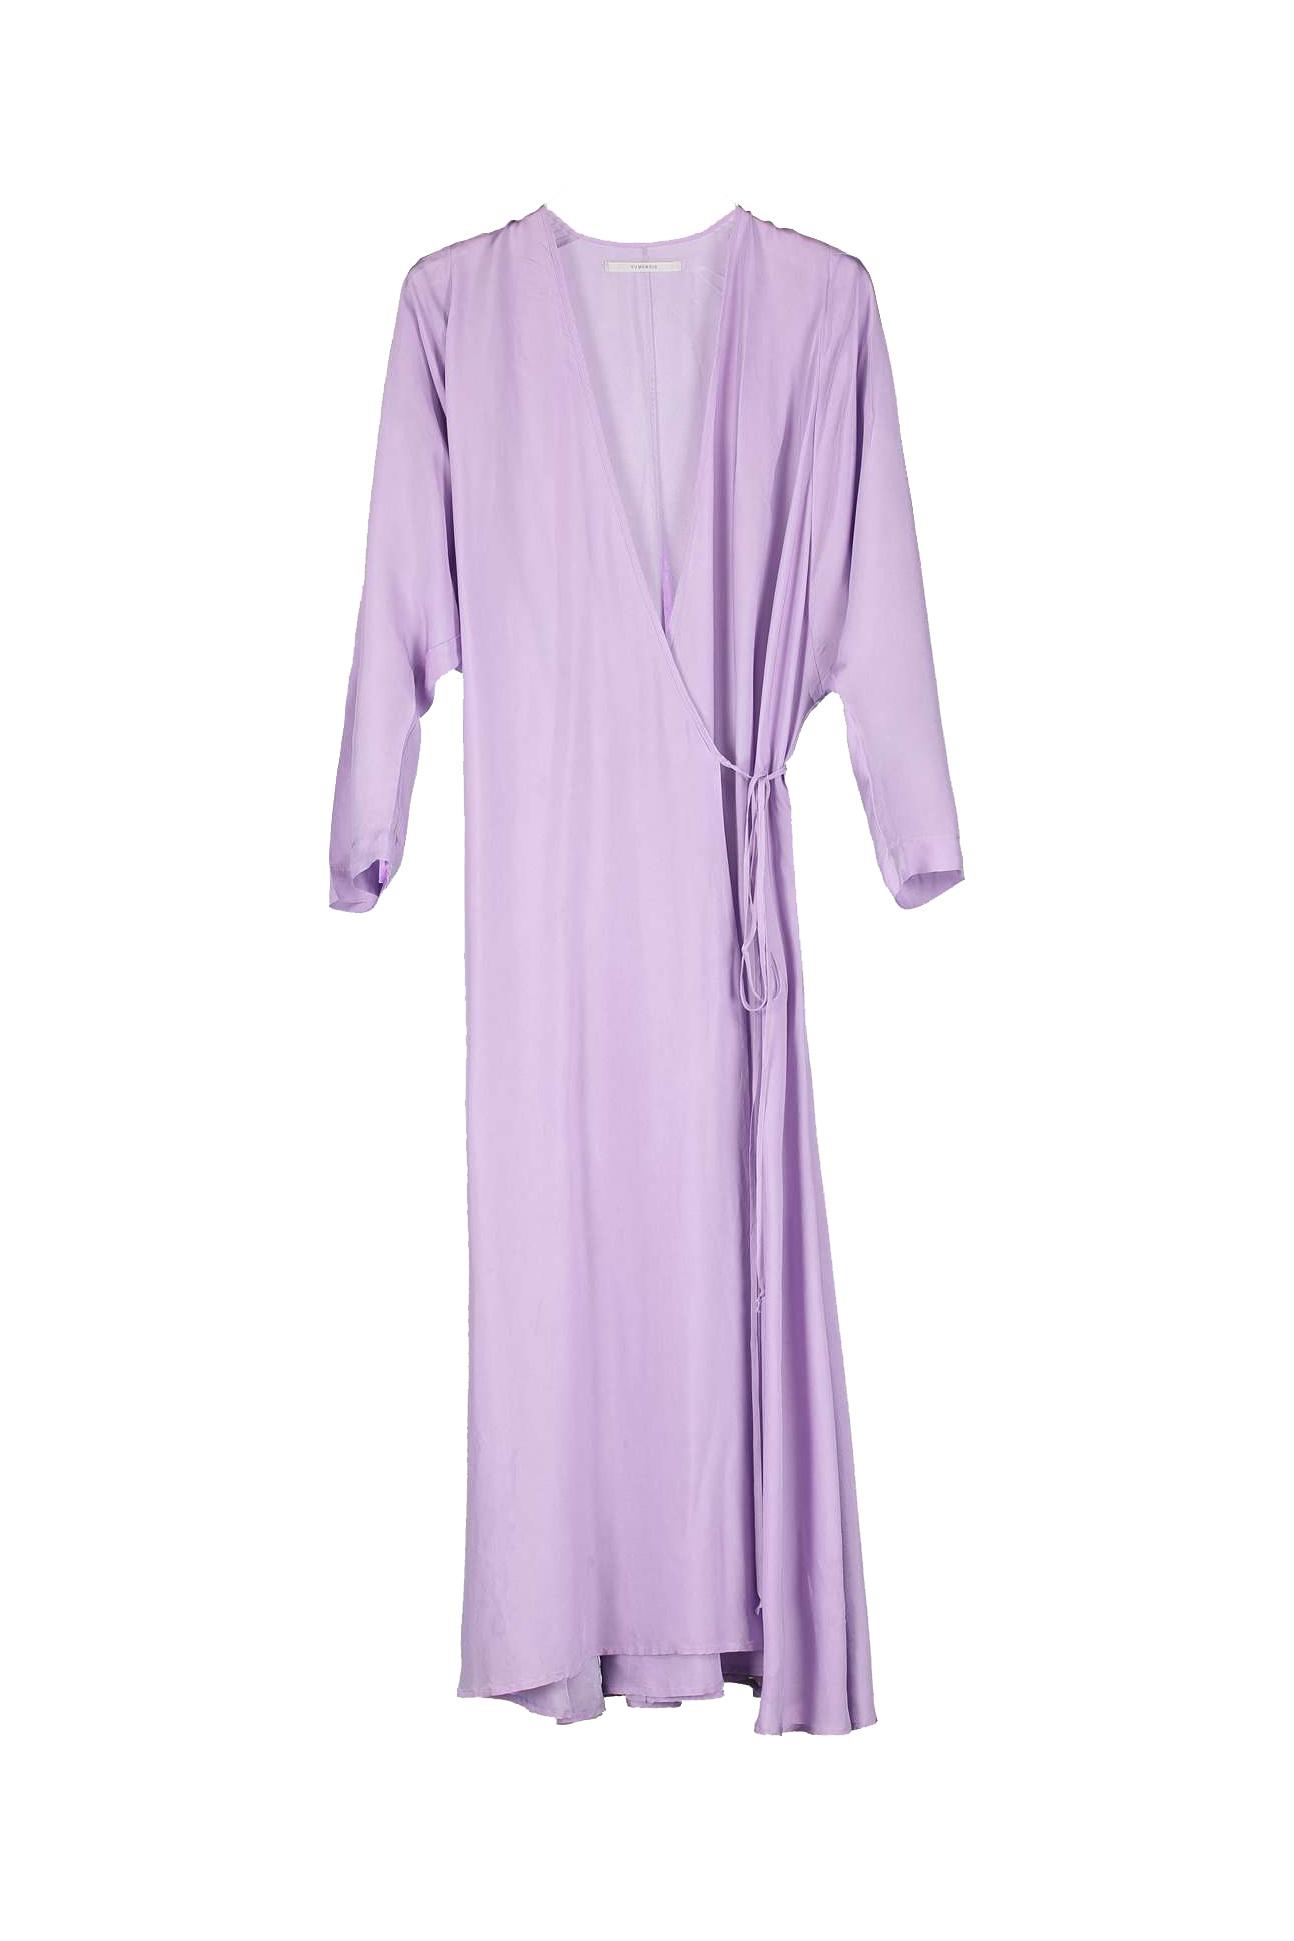 Duva Dress - Violet-1